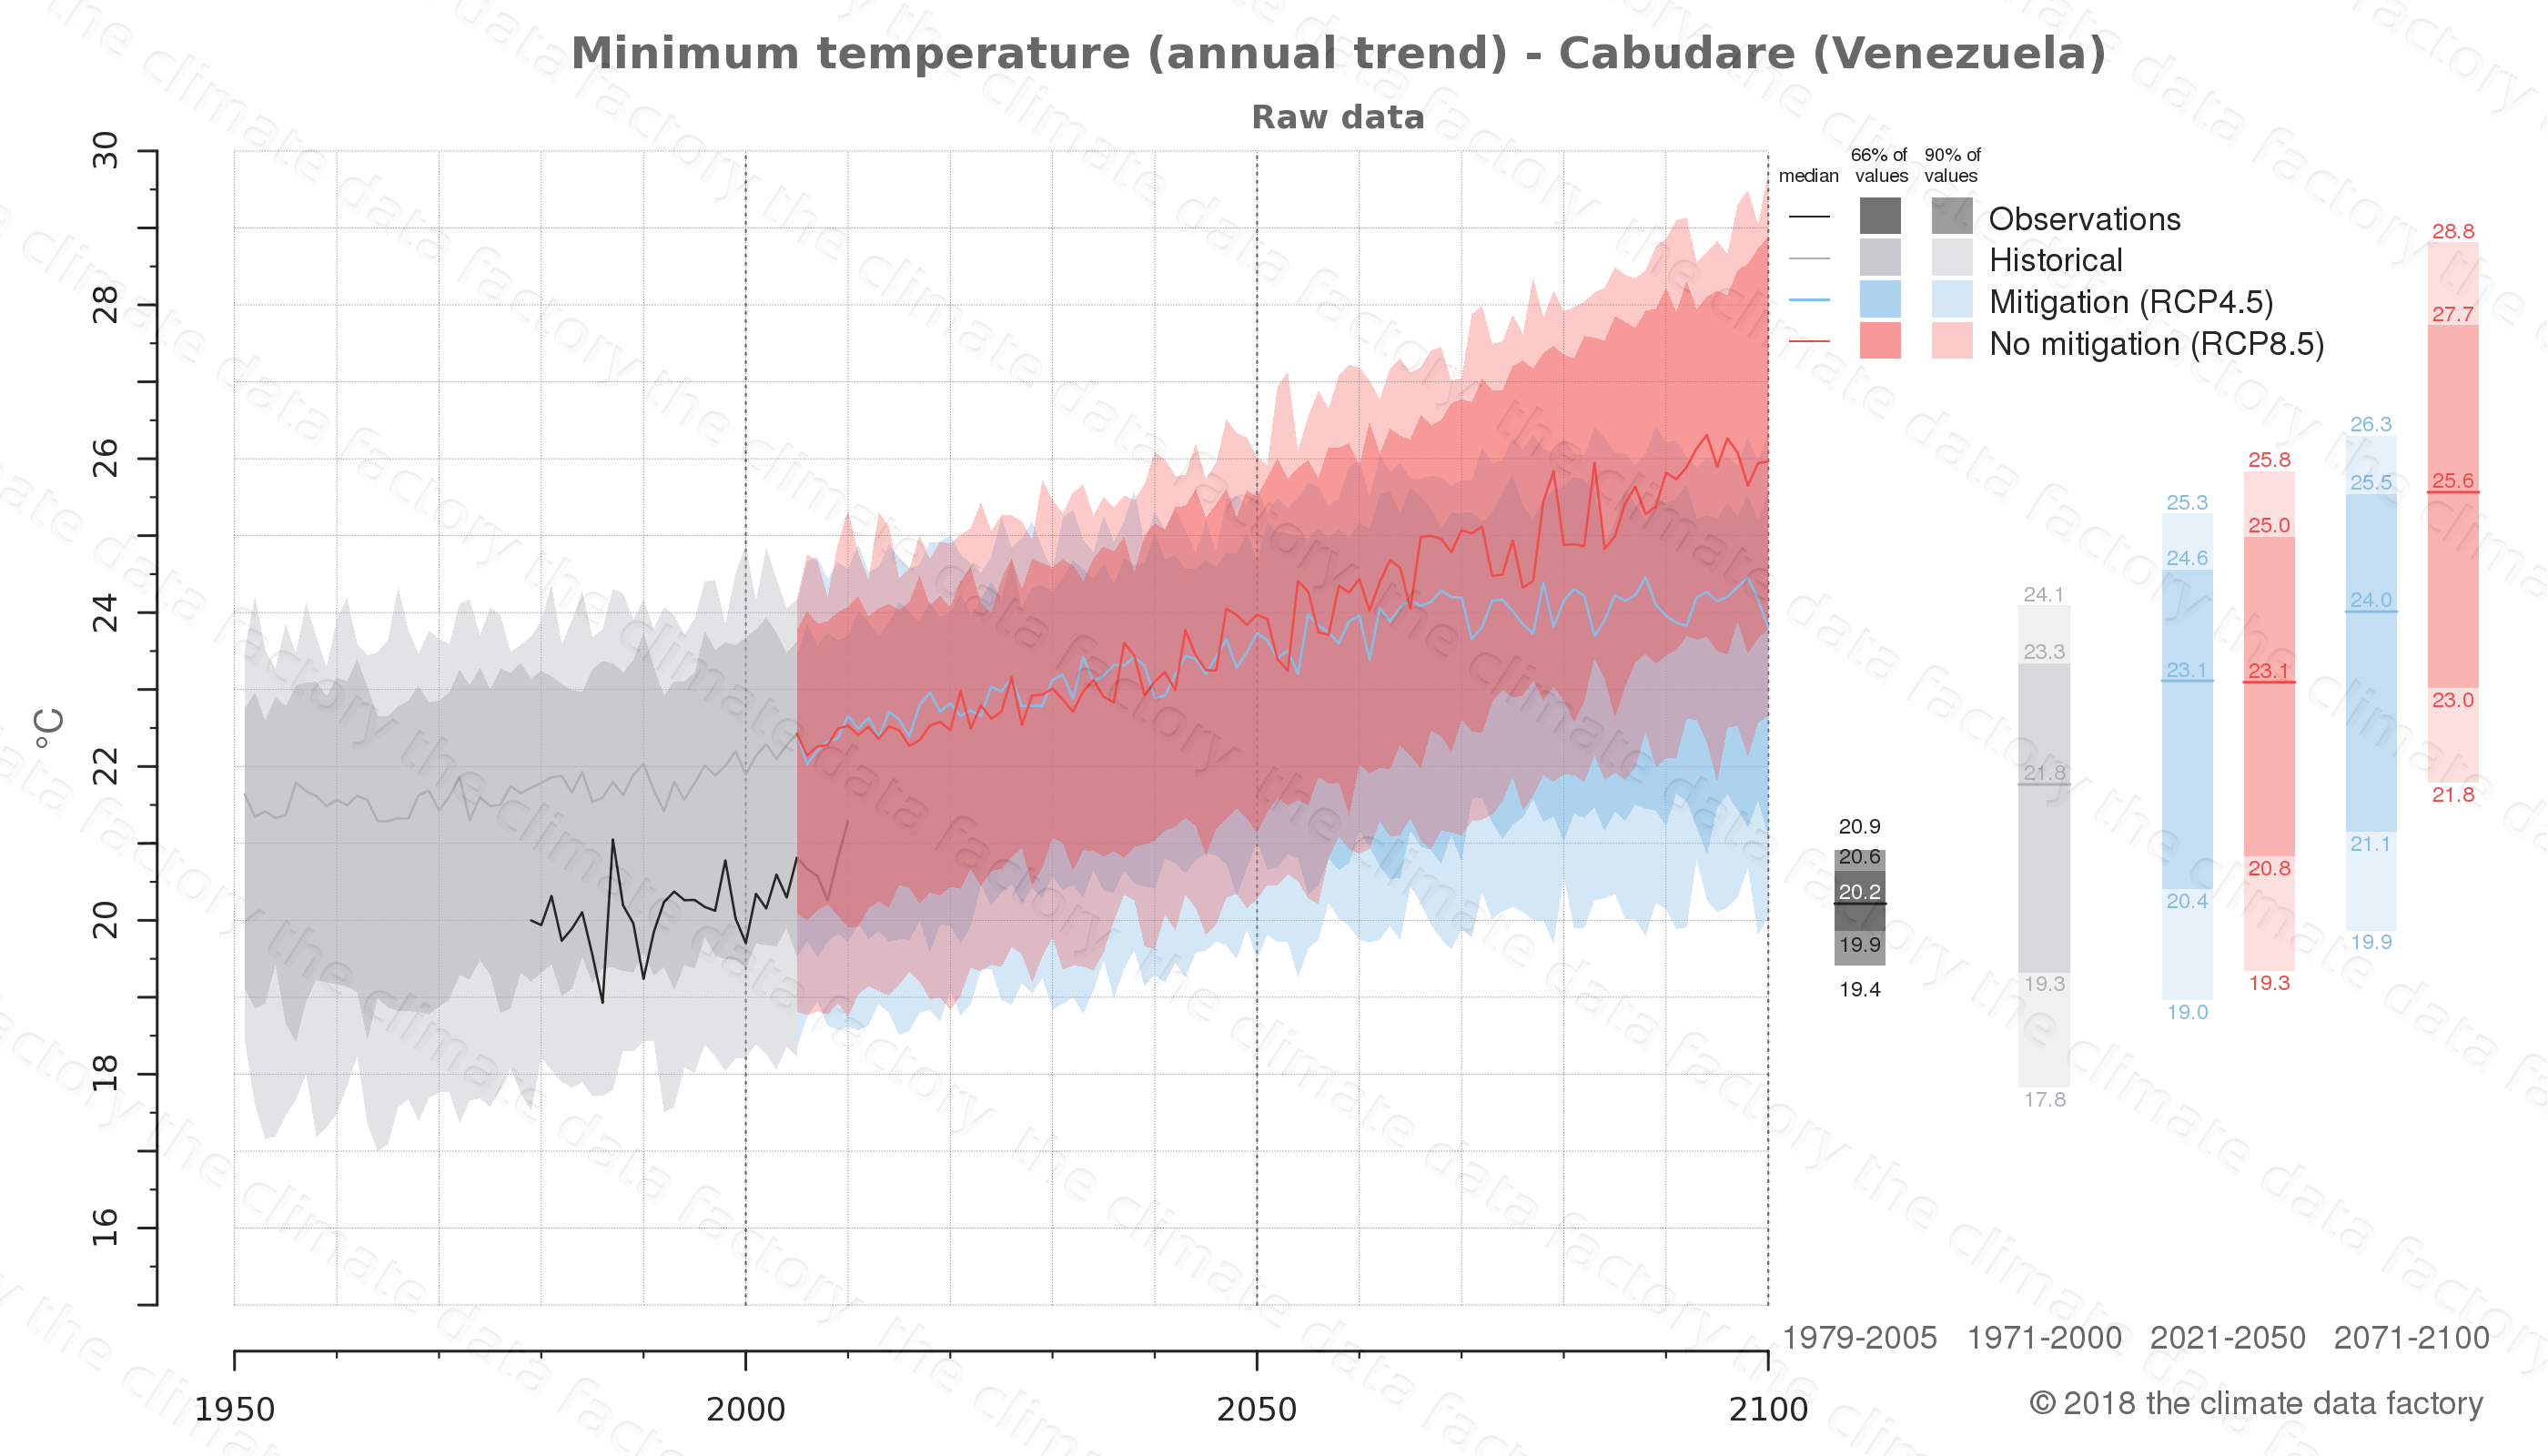 climate change data policy adaptation climate graph city data minimum-temperature cabudare venezuela